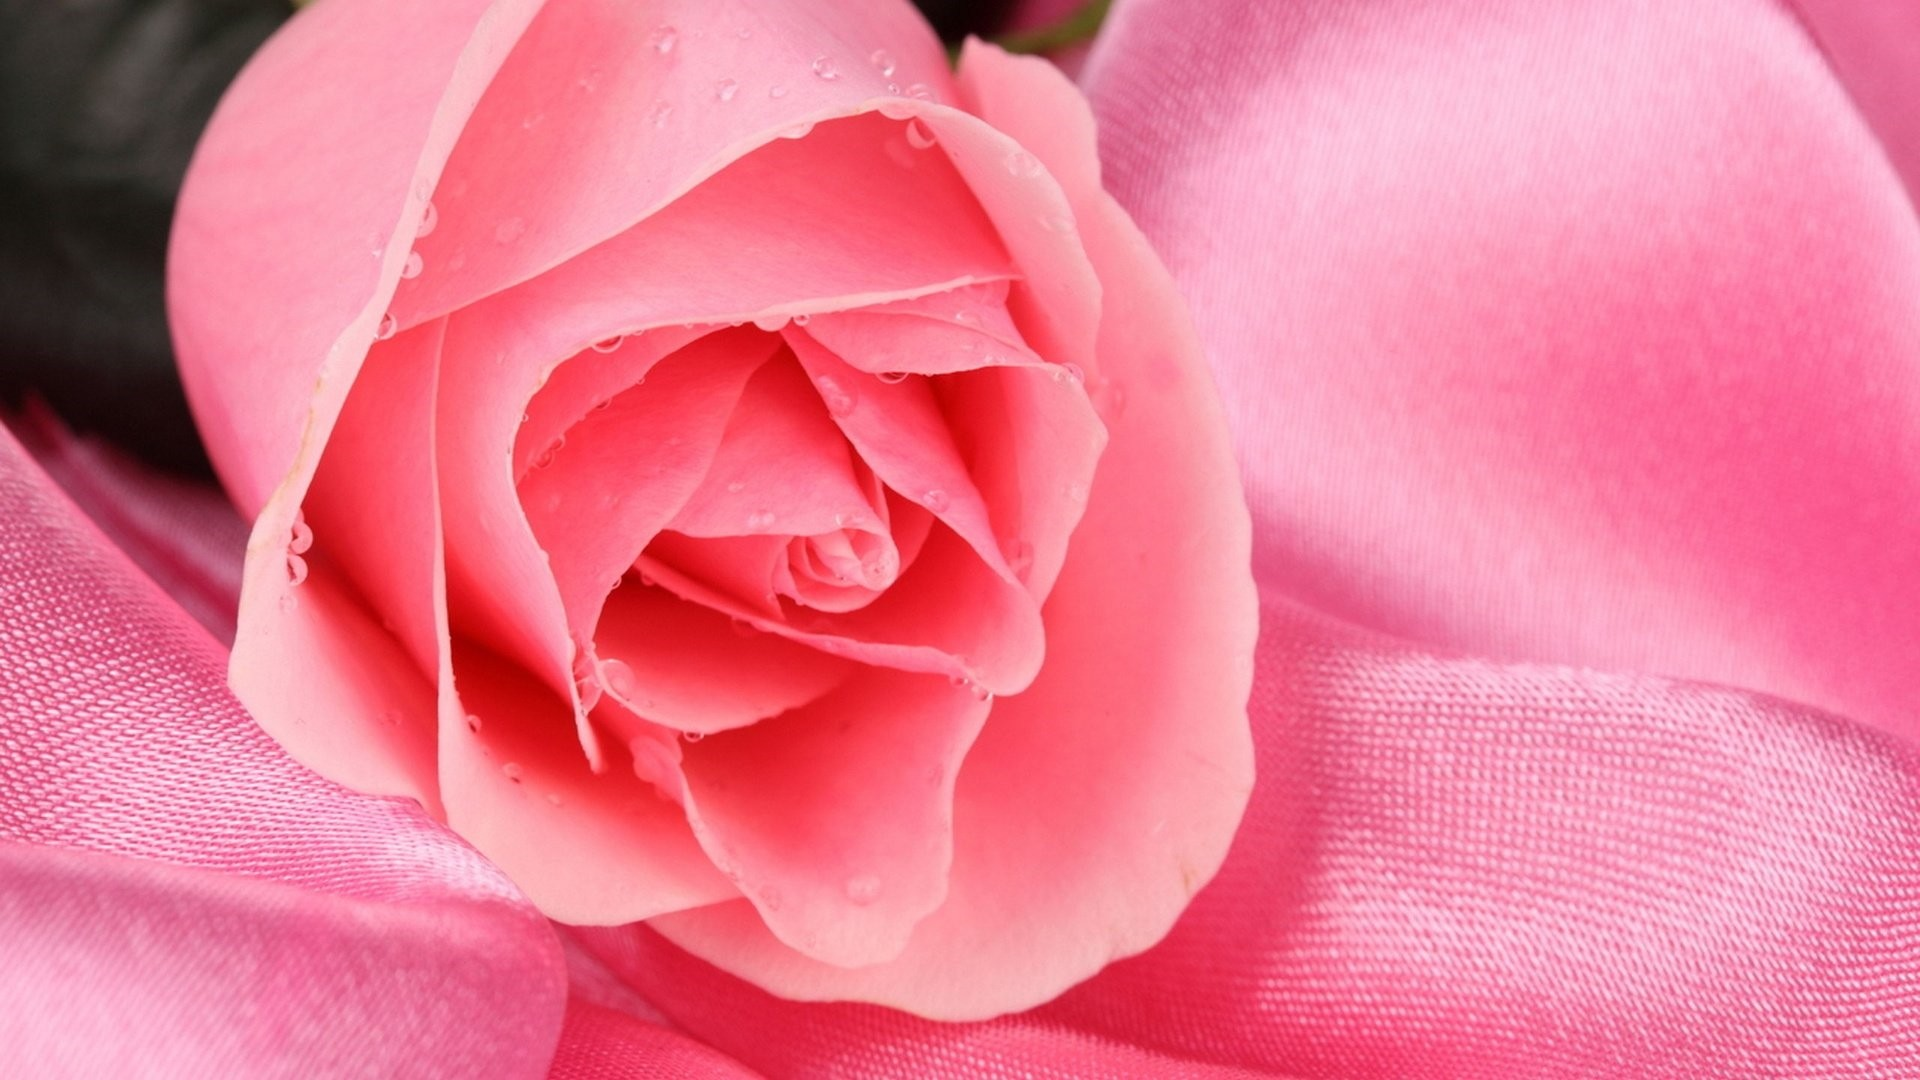 Pink Rose hd wallpaper download